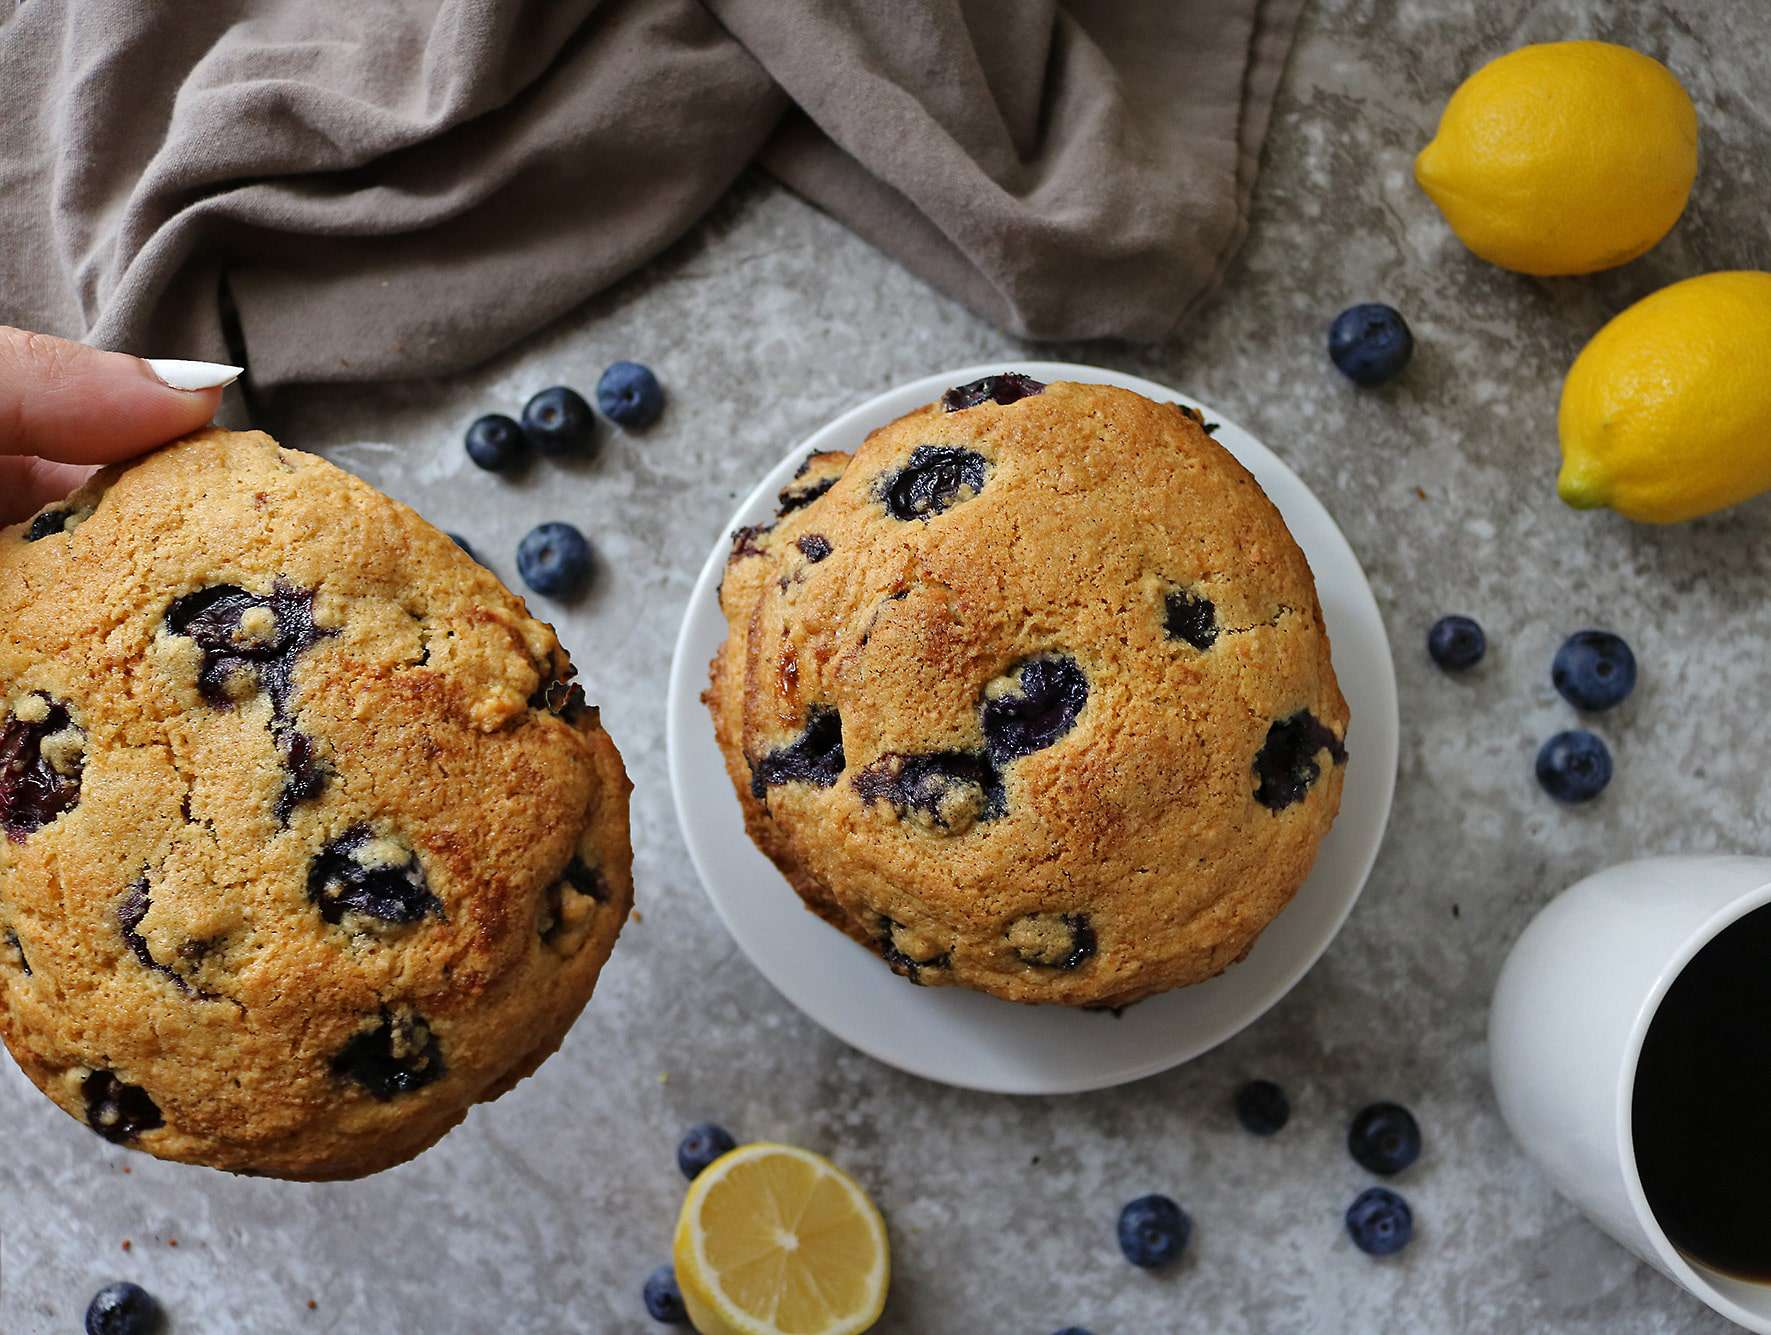 Gluten Free Lemon Blueberry Muffin Tops Pic